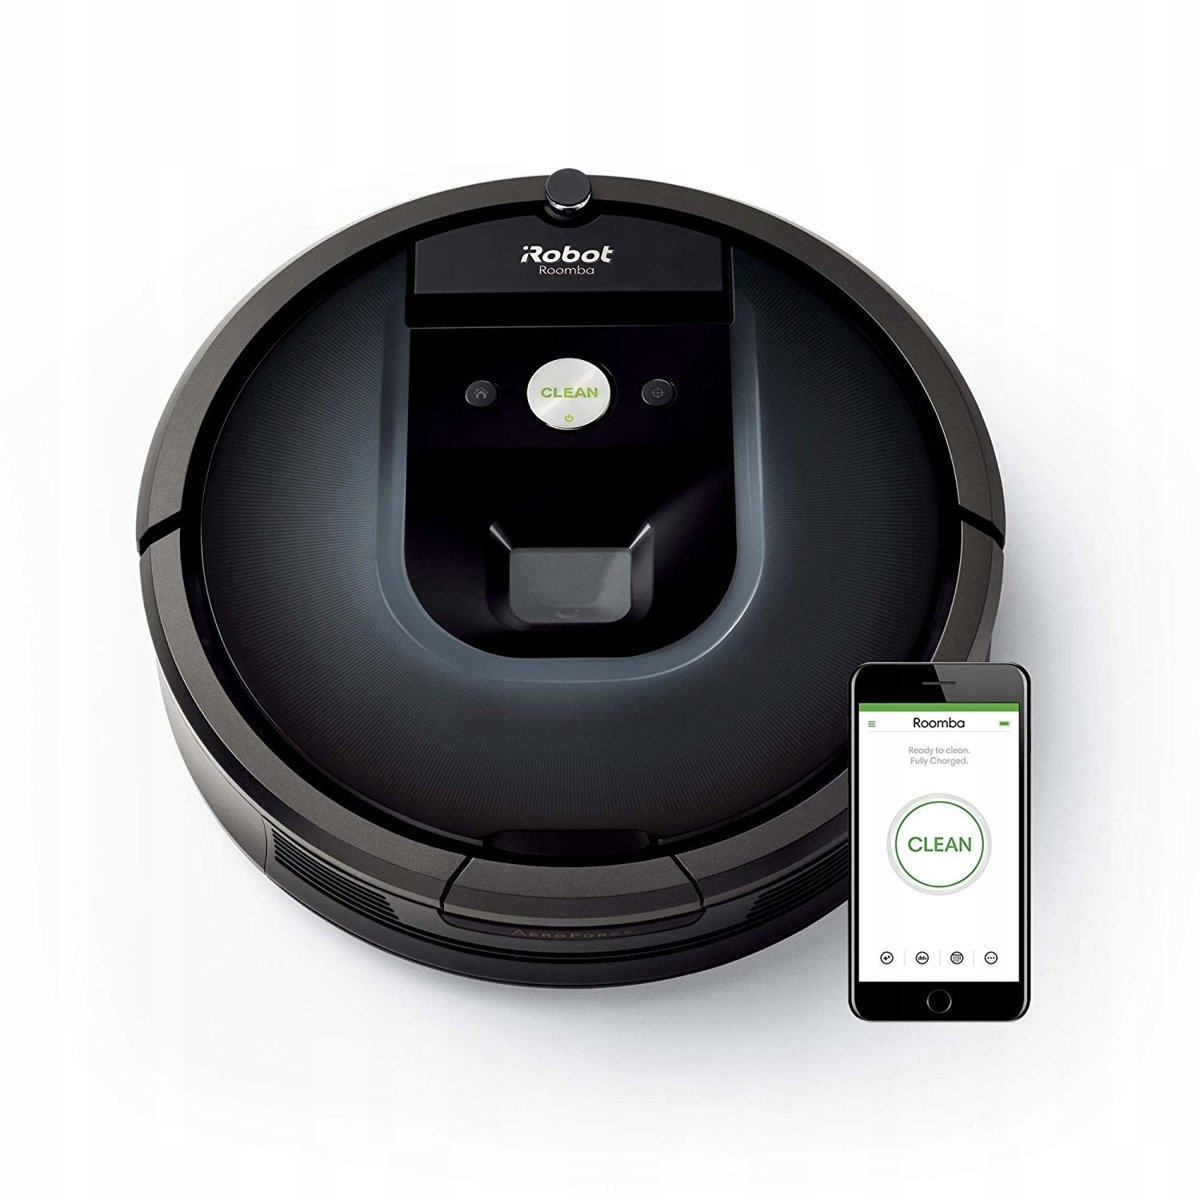 Робот iRobot Roomba 981 980 Black Edition